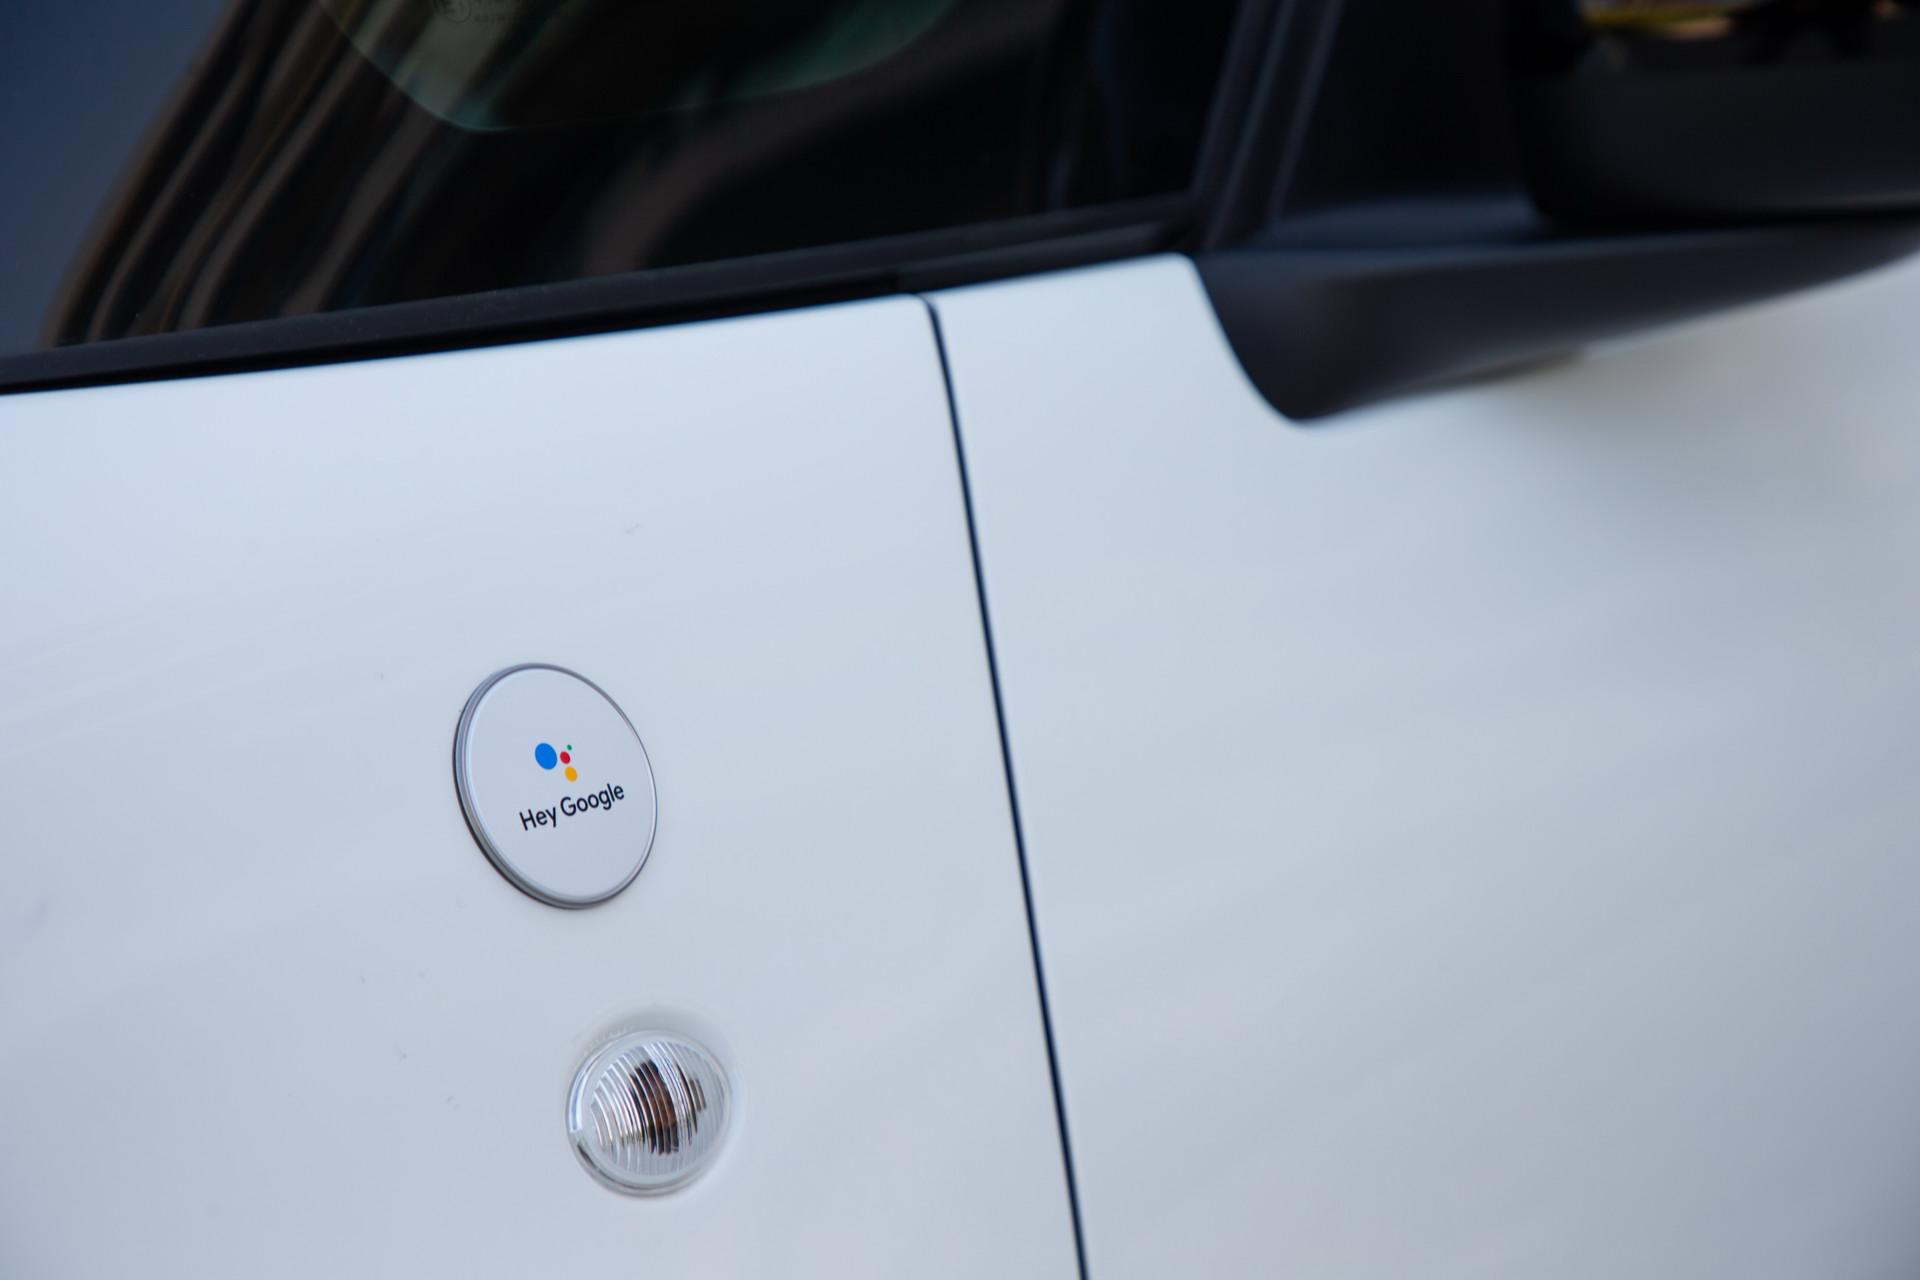 fiat 500 hey google badge